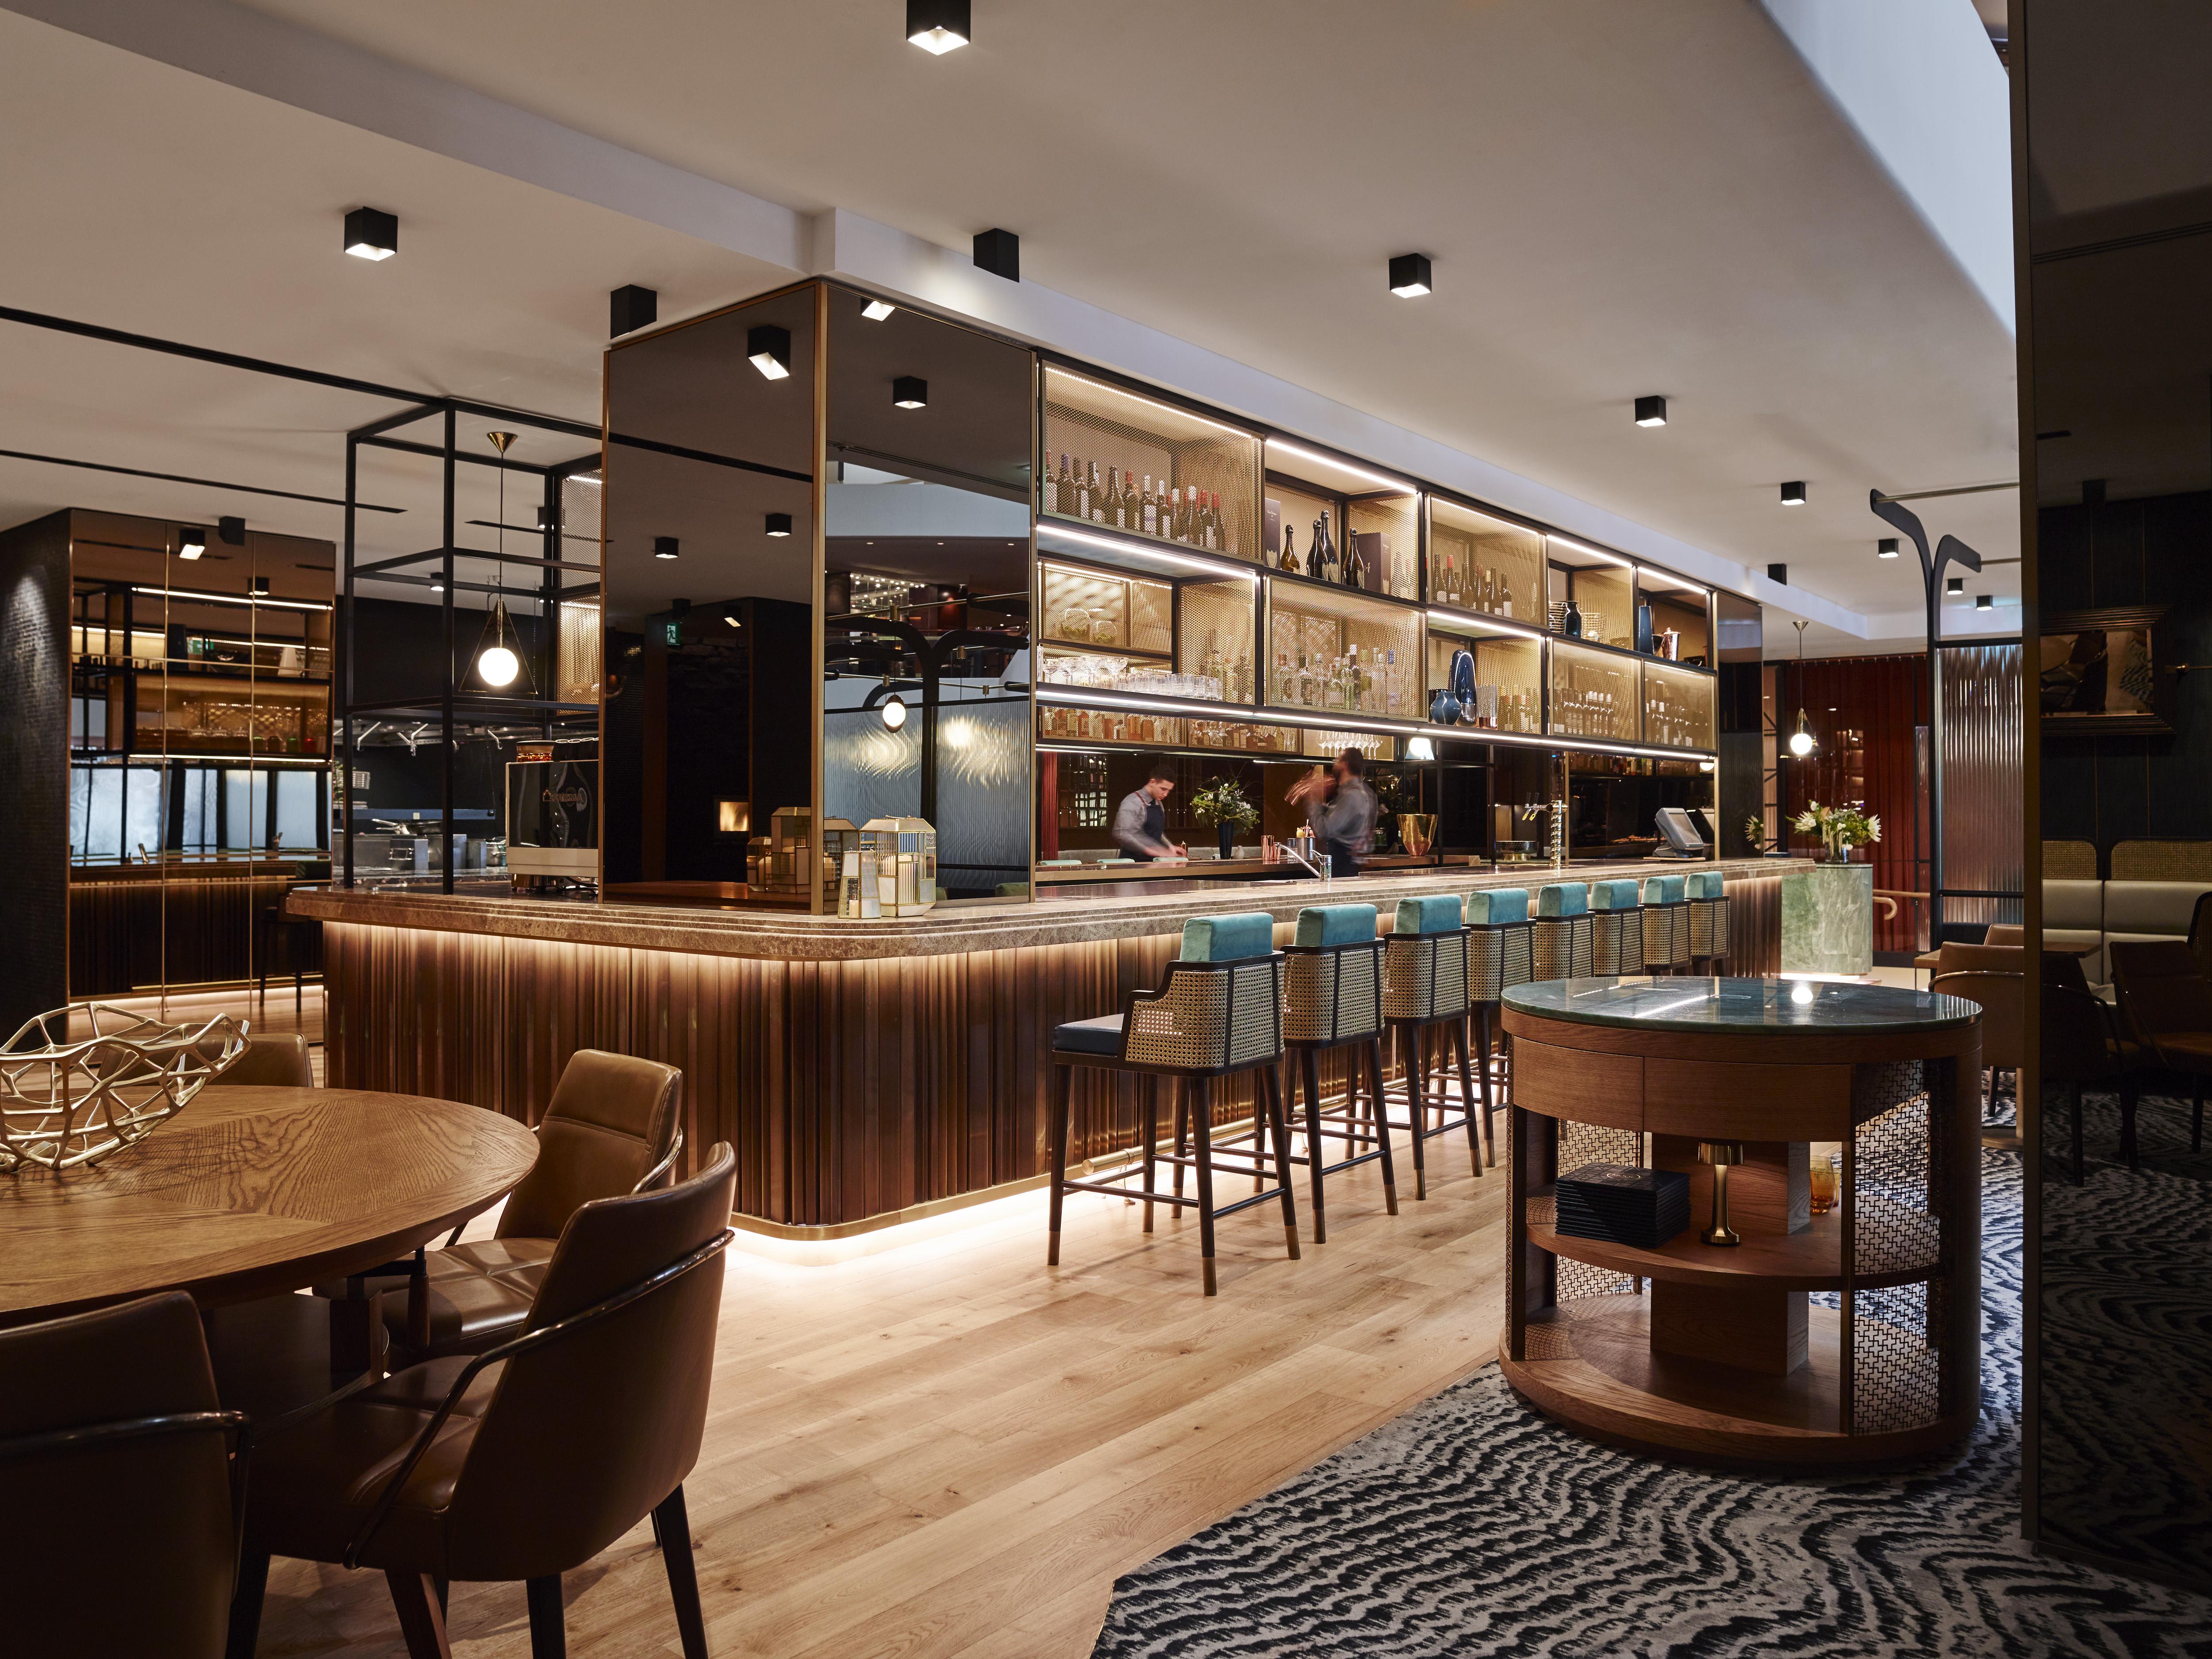 Four seasons hotel sydney restaurants - Cuisine a la mode ...